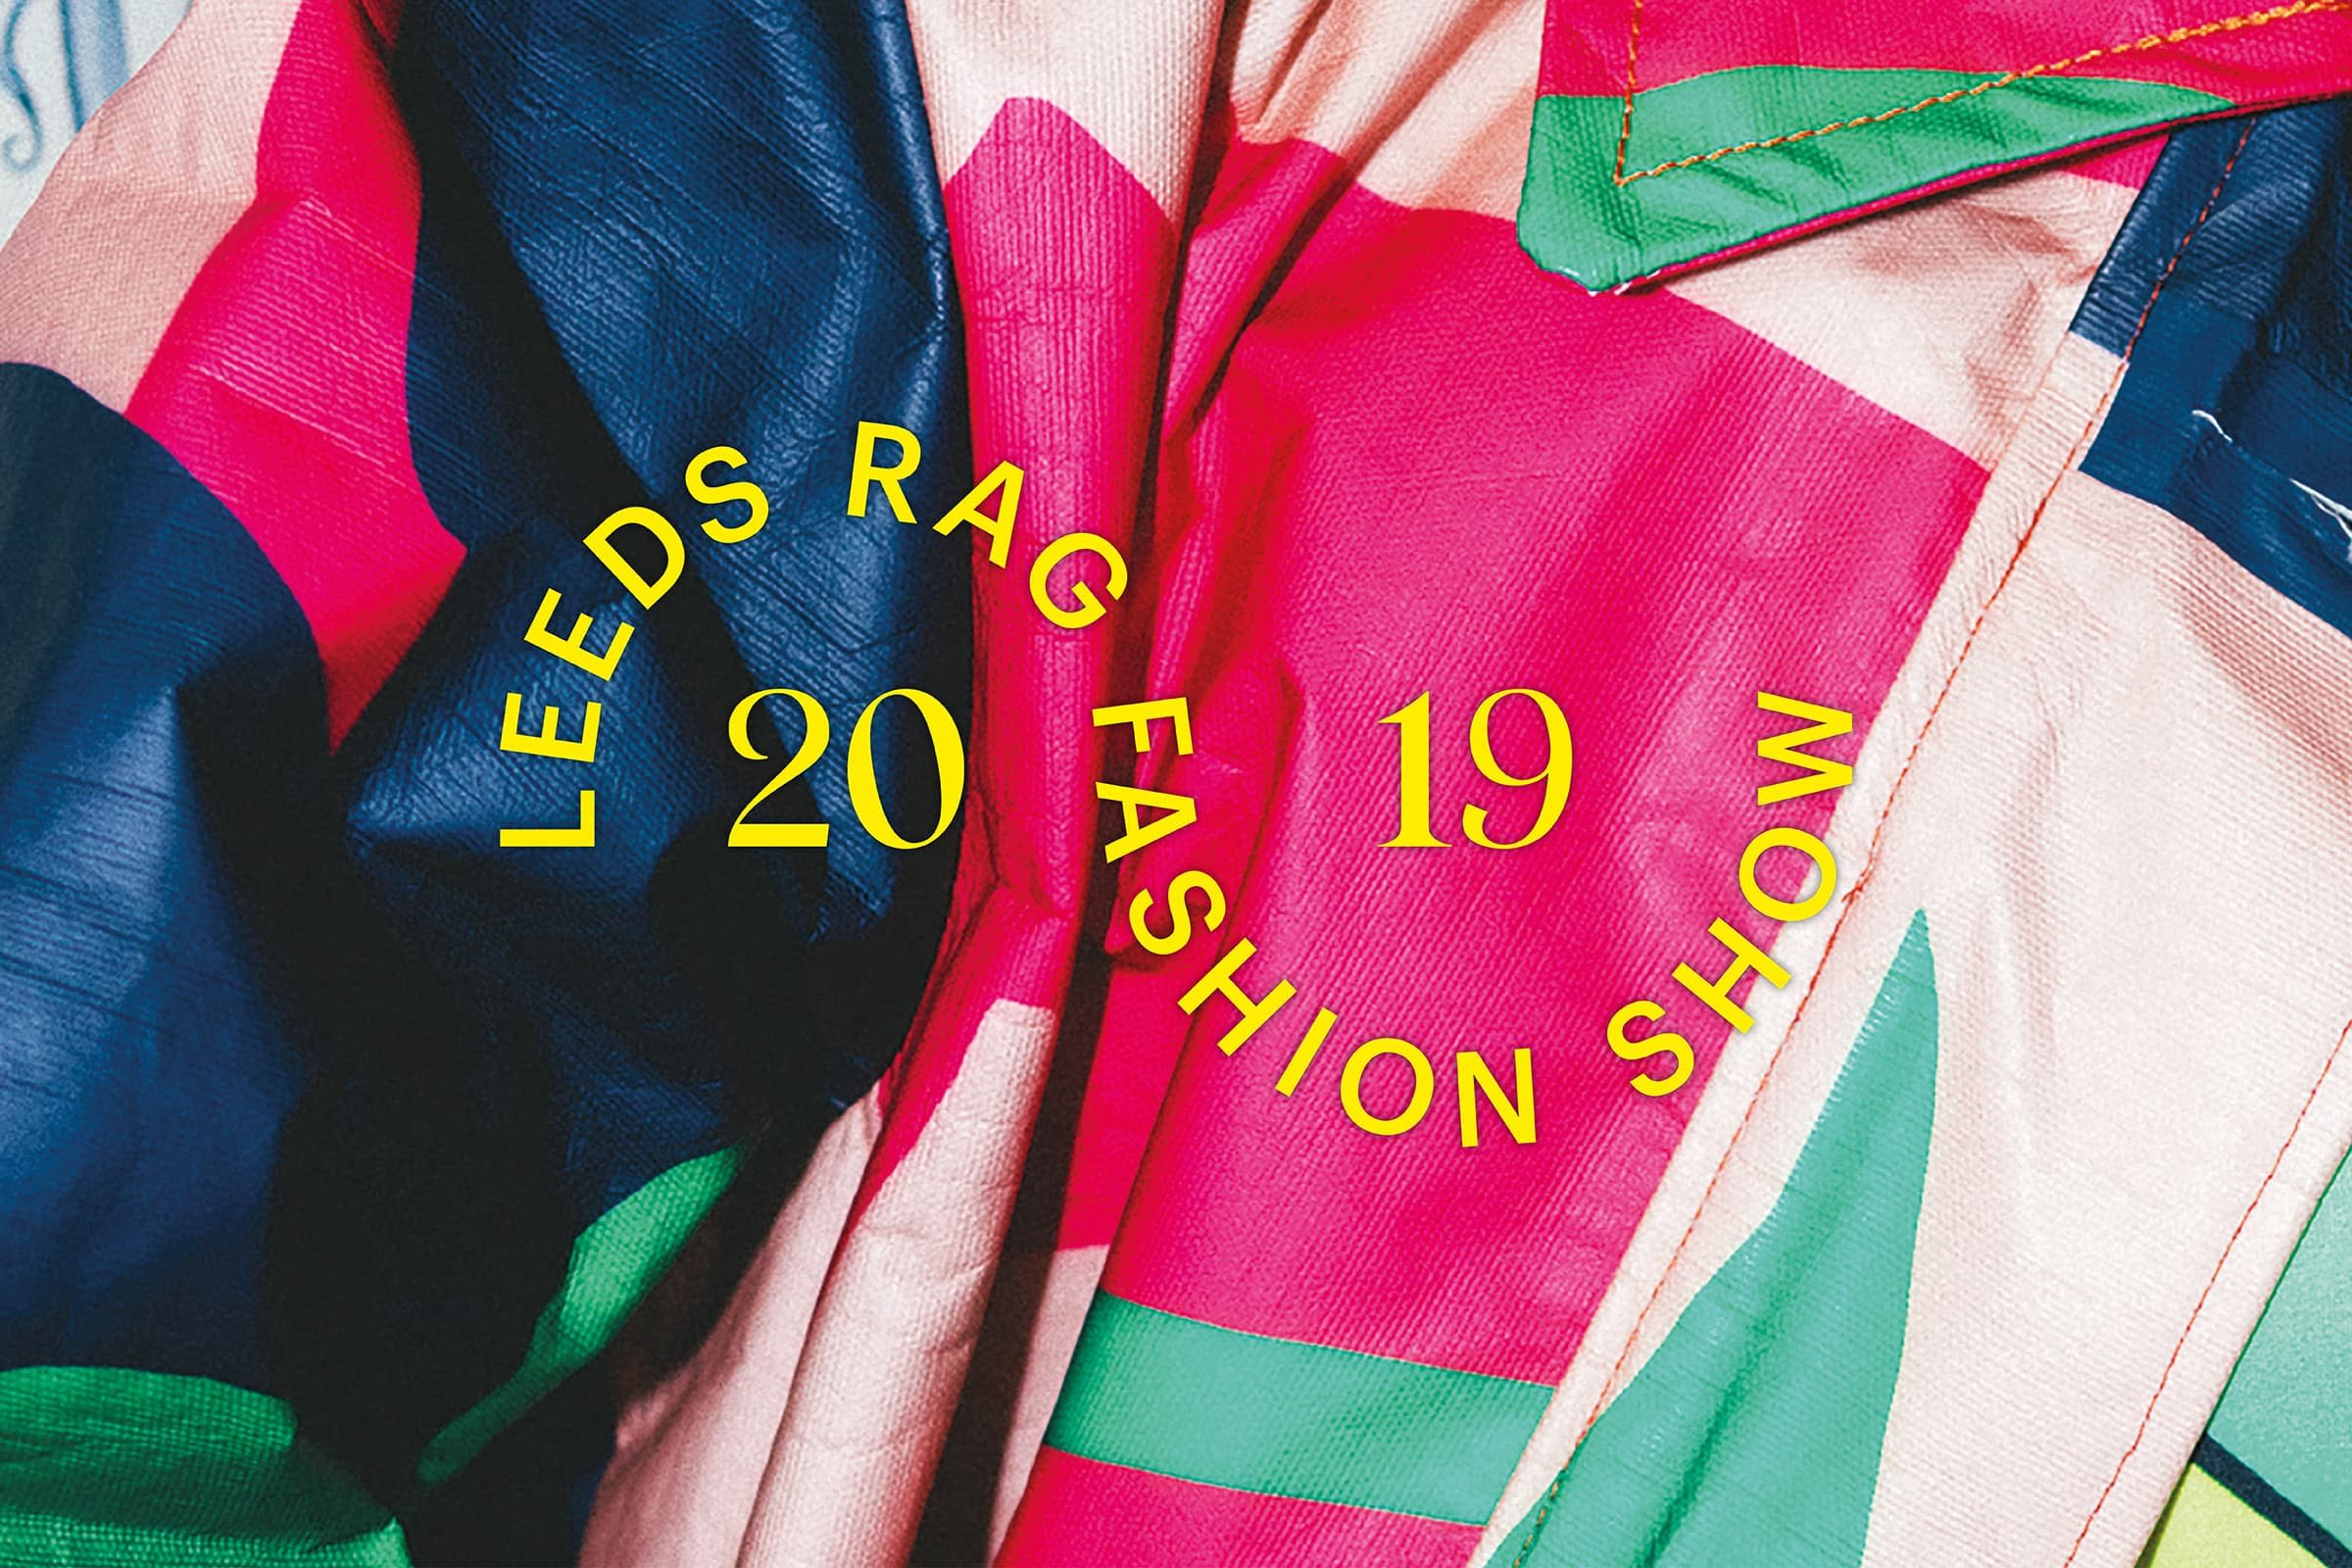 saul studio — Leeds RAG Fashion Show 2019